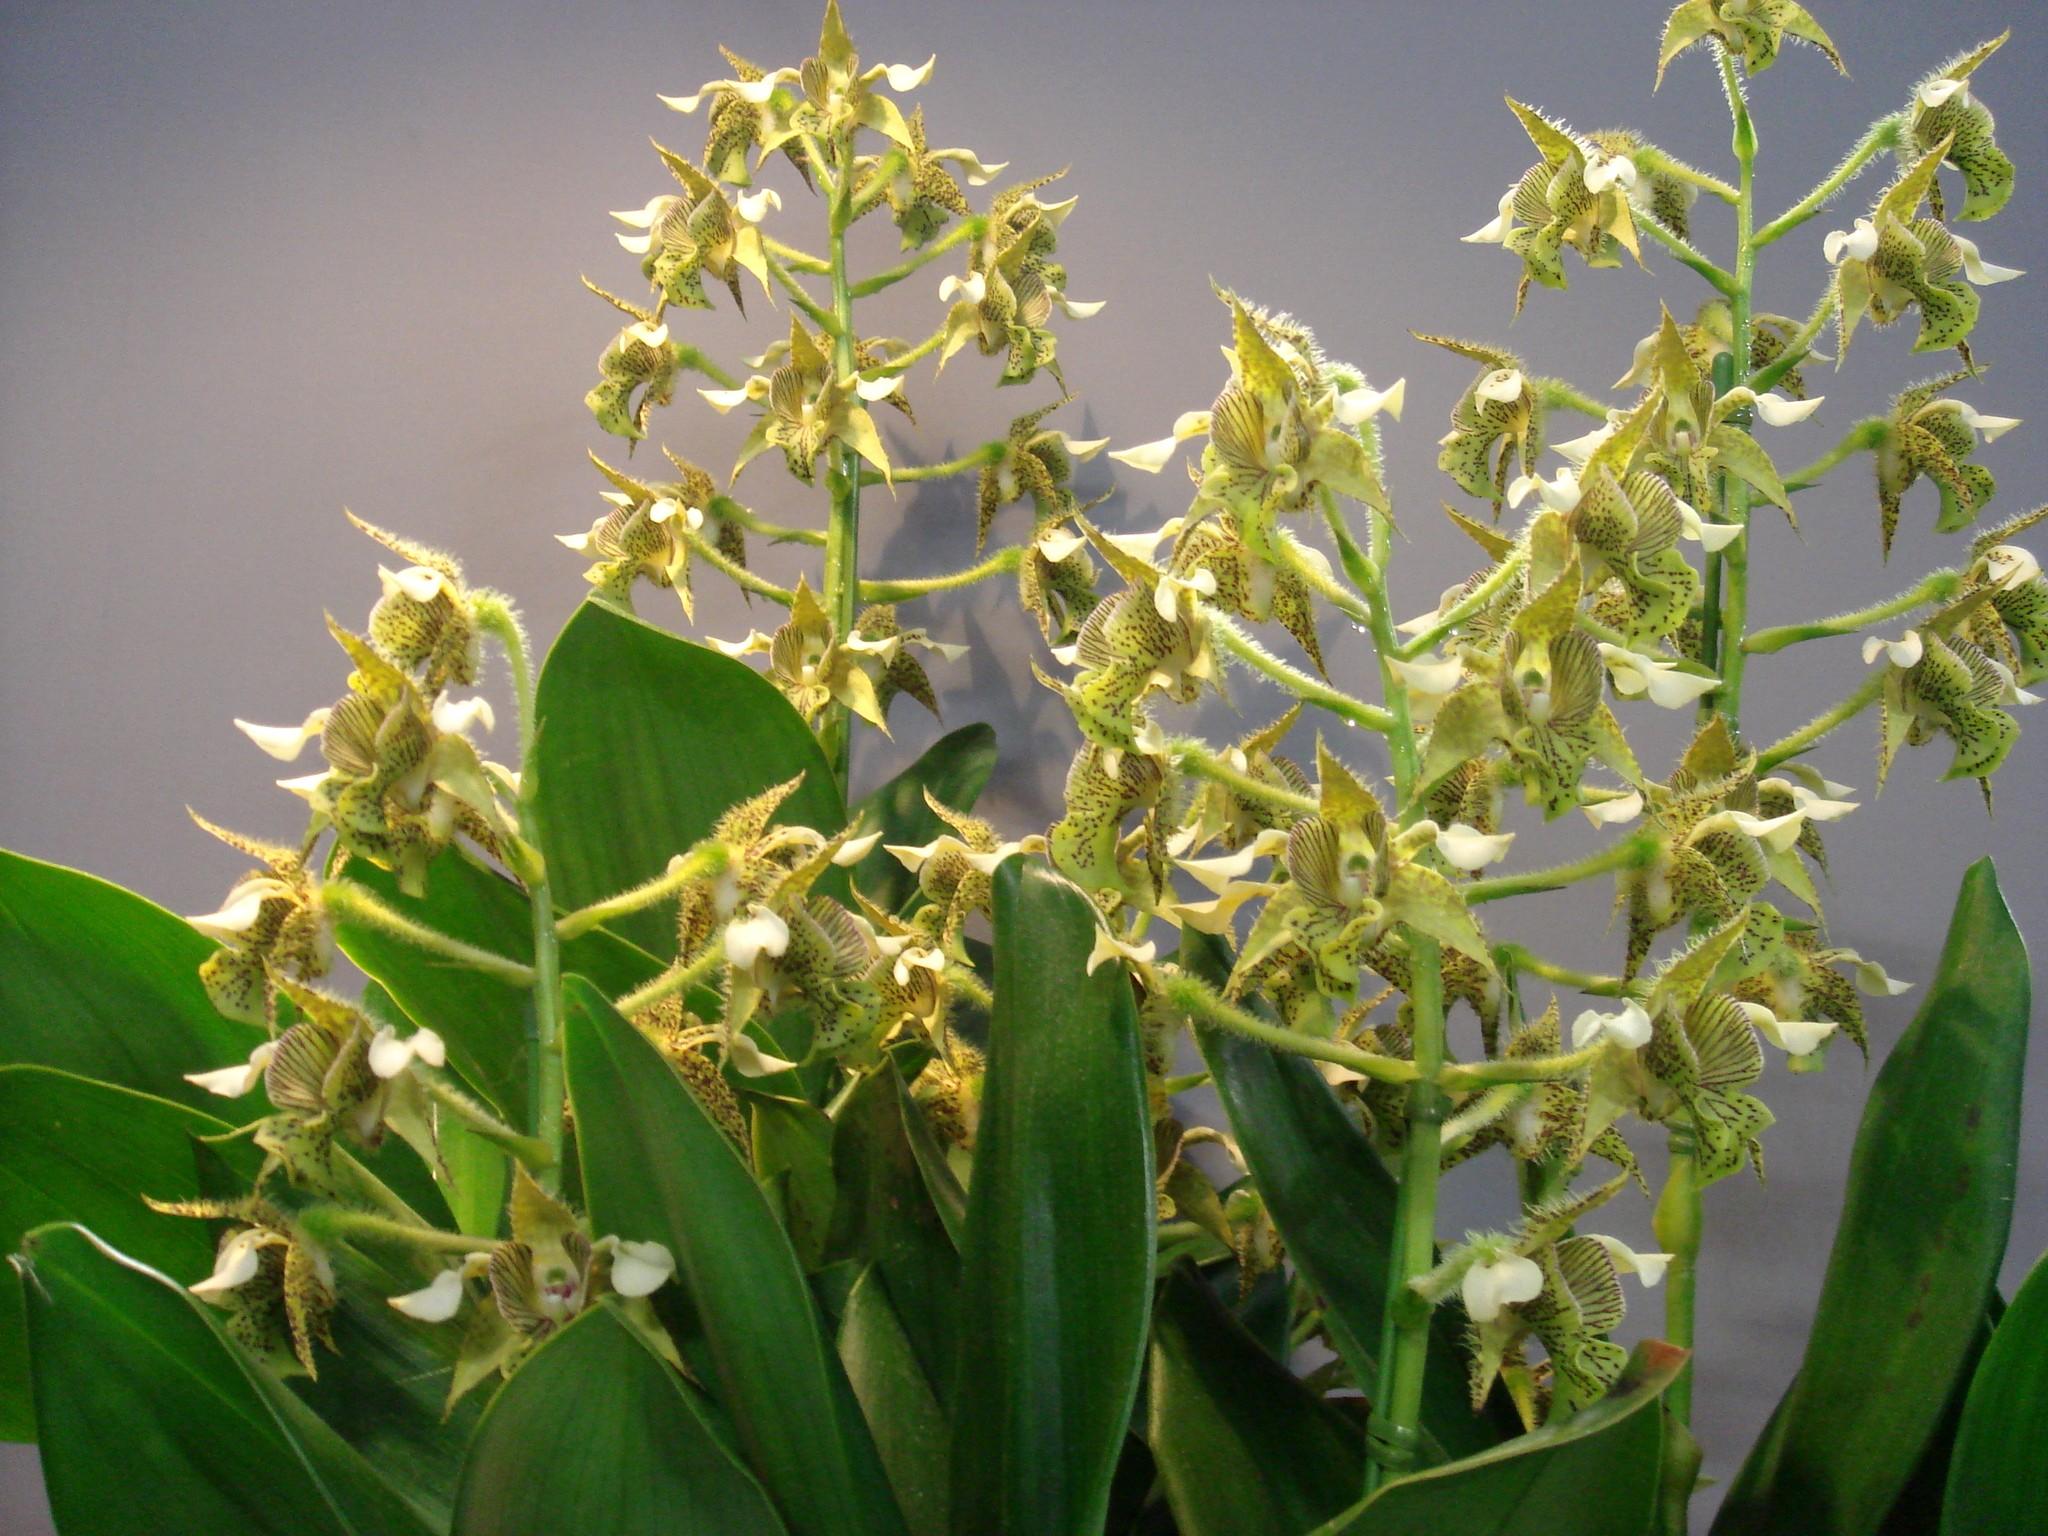 http://orchids.la.coocan.jp/Dendrobium/Dendrobium%20macrophyllum/DSC06250.JPG